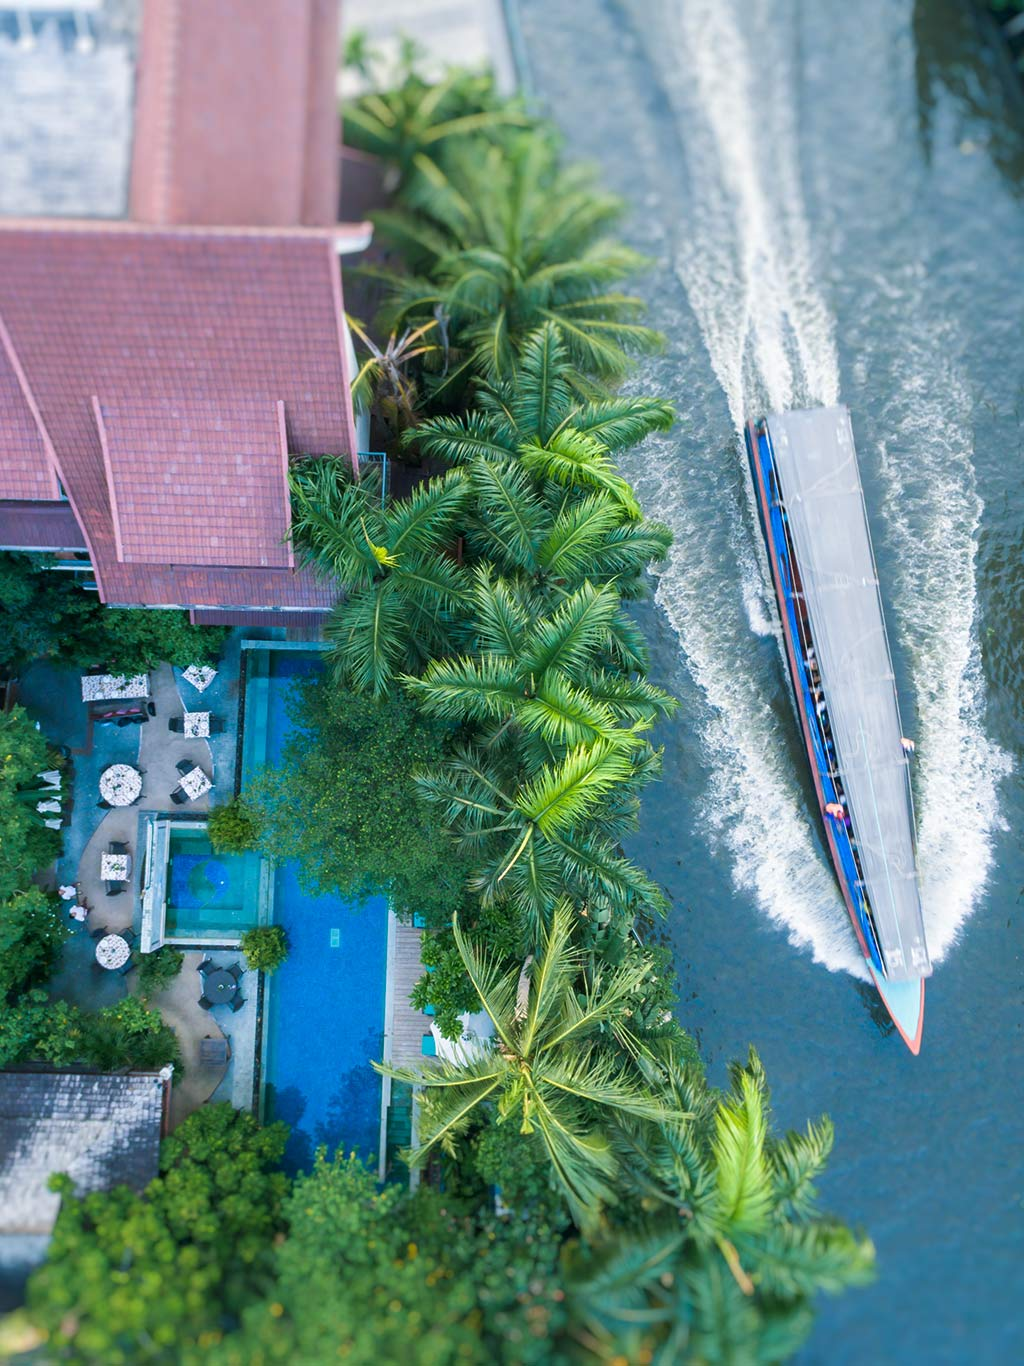 Ariyasom: The secret canals of Bangkok